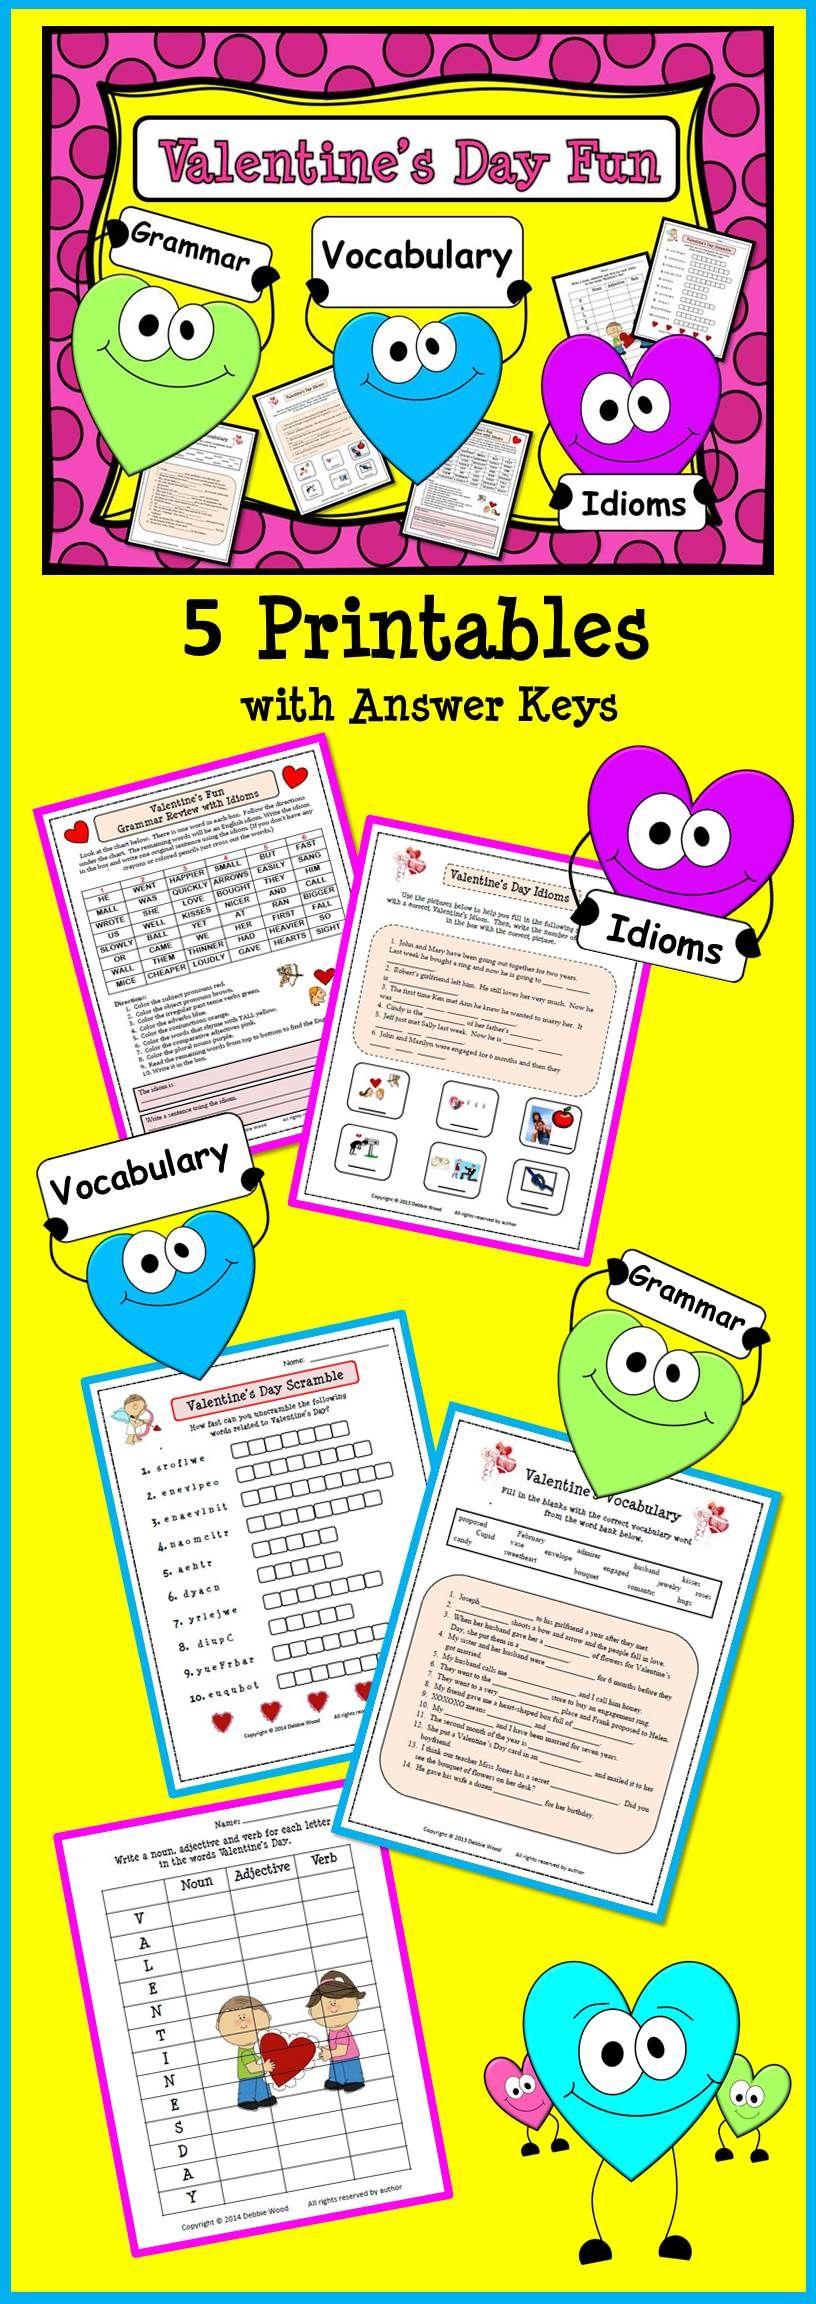 Valentine S Day Fun Grammar Vocabulary Idioms Idioms Fun Language Arts Valentines Day Activities [ 2304 x 816 Pixel ]